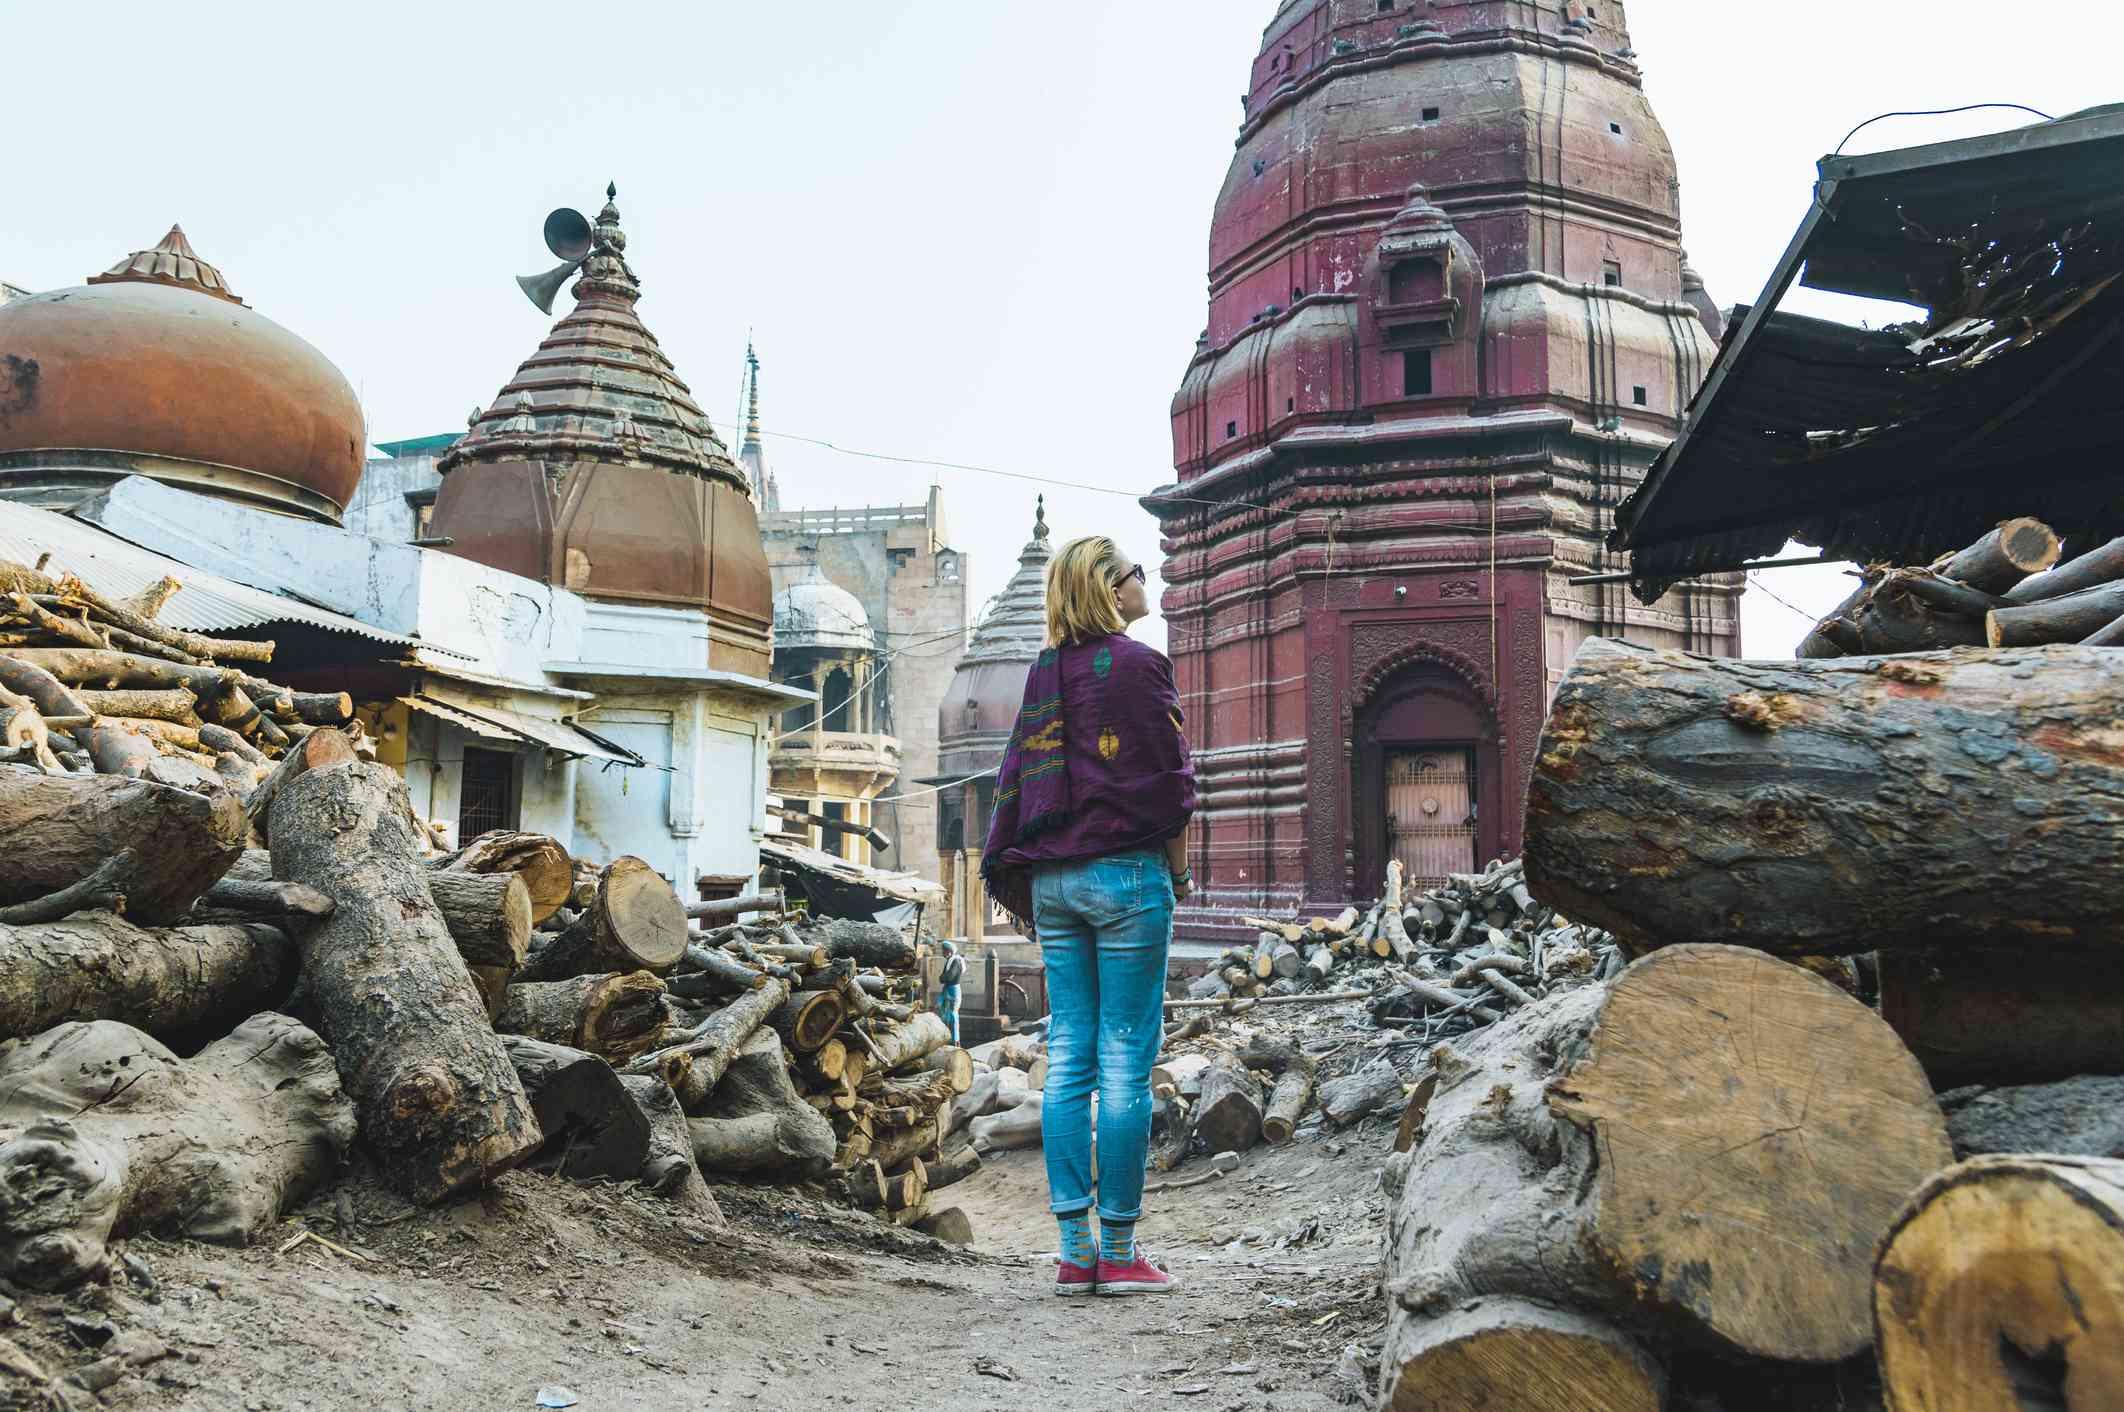 Tourist at Varanasi Burning ghats.